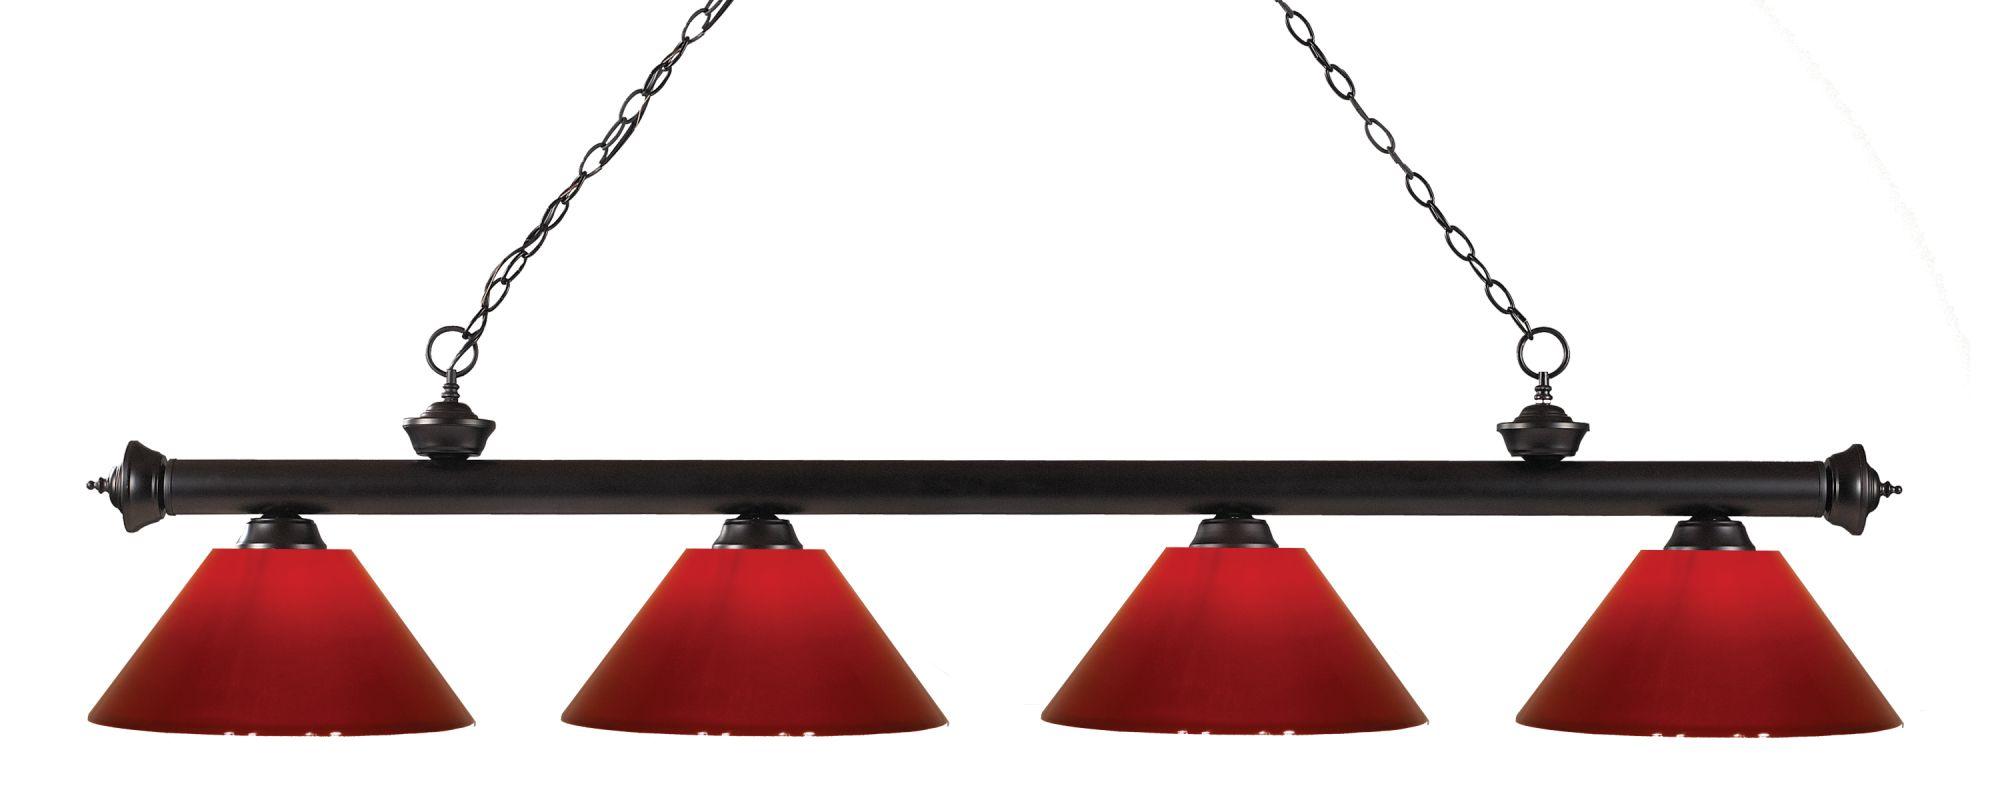 Z-Lite 200-4-PRD Riviera 4 Light Island/Billiard Light with Red Sale $352.00 ITEM: bci2564659 ID#:200-4BRZ-PRD UPC: 685659041842 :